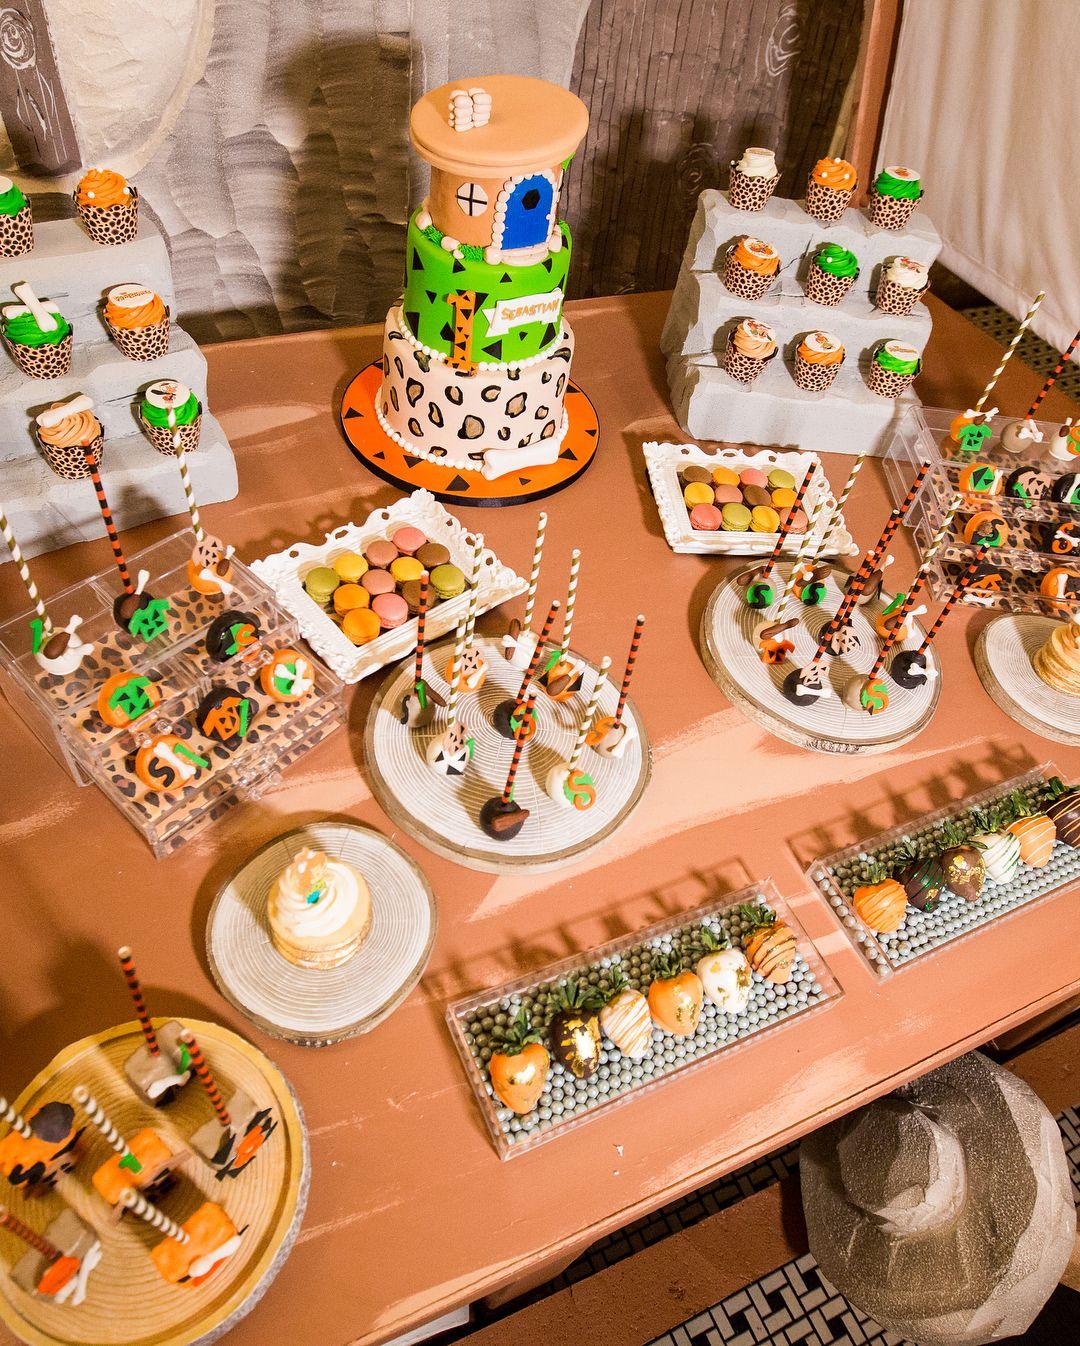 Throwback To The Coolest Flintstones Dessert Table Ever